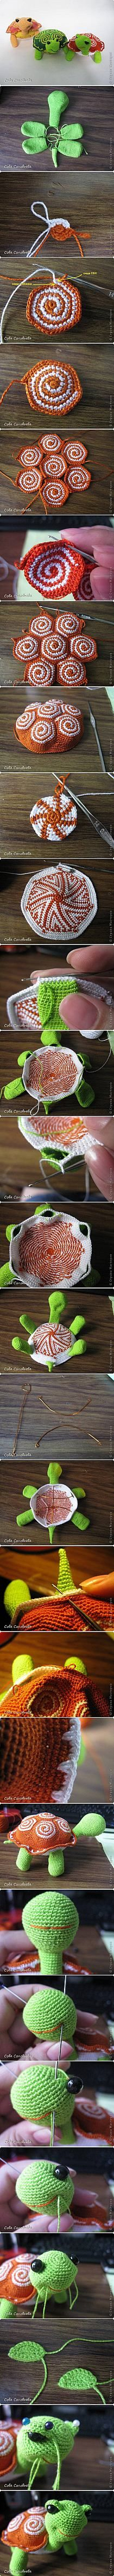 Żółwik